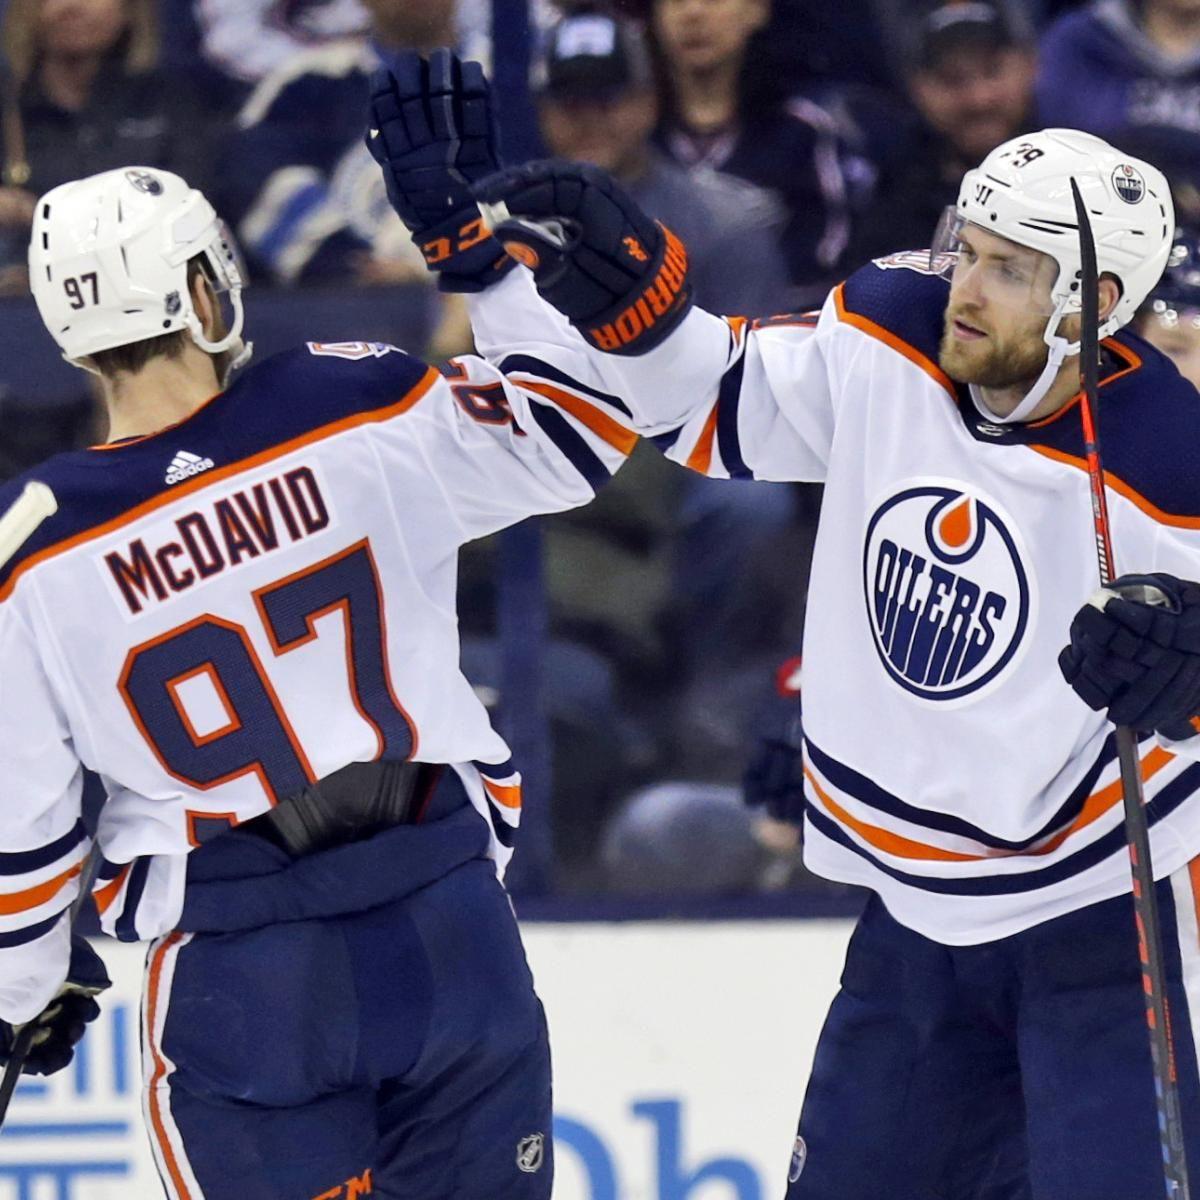 Leon Draisaitl Sergei Bobrovsky Top Highlights From Mar 26 Oilers Columbus Blue Jackets Blue Jacket